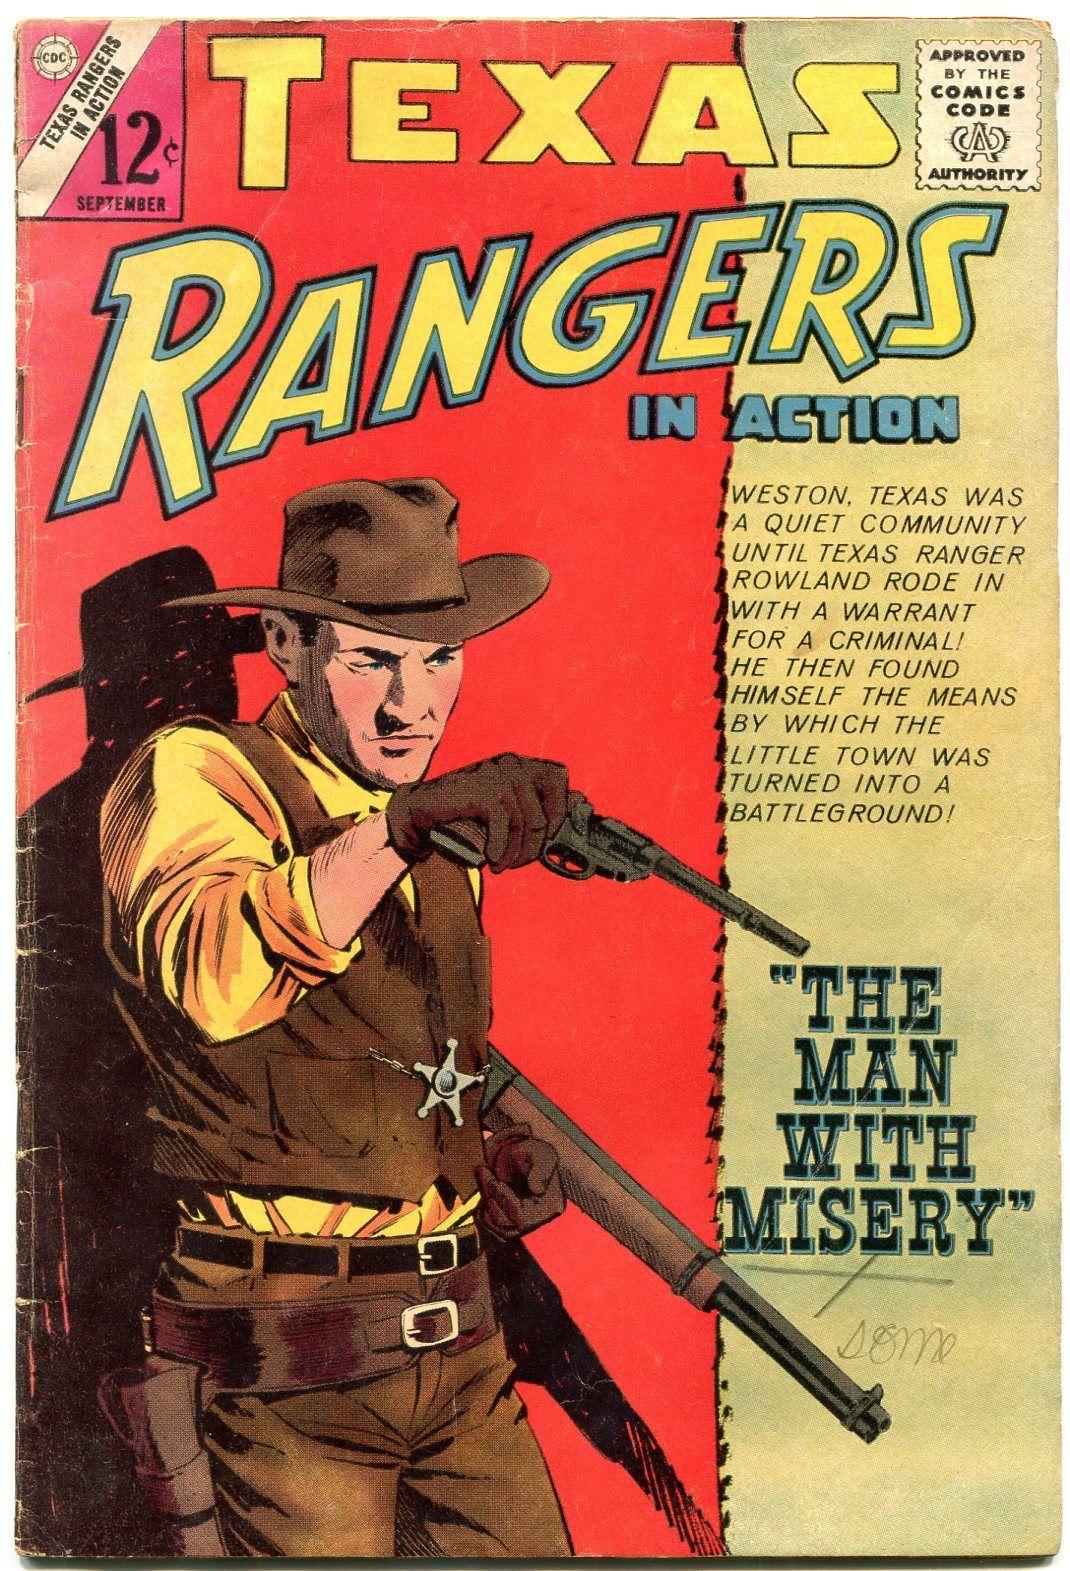 Texas Rangers #46 1964- Charlton Western comic- Gatling Gun